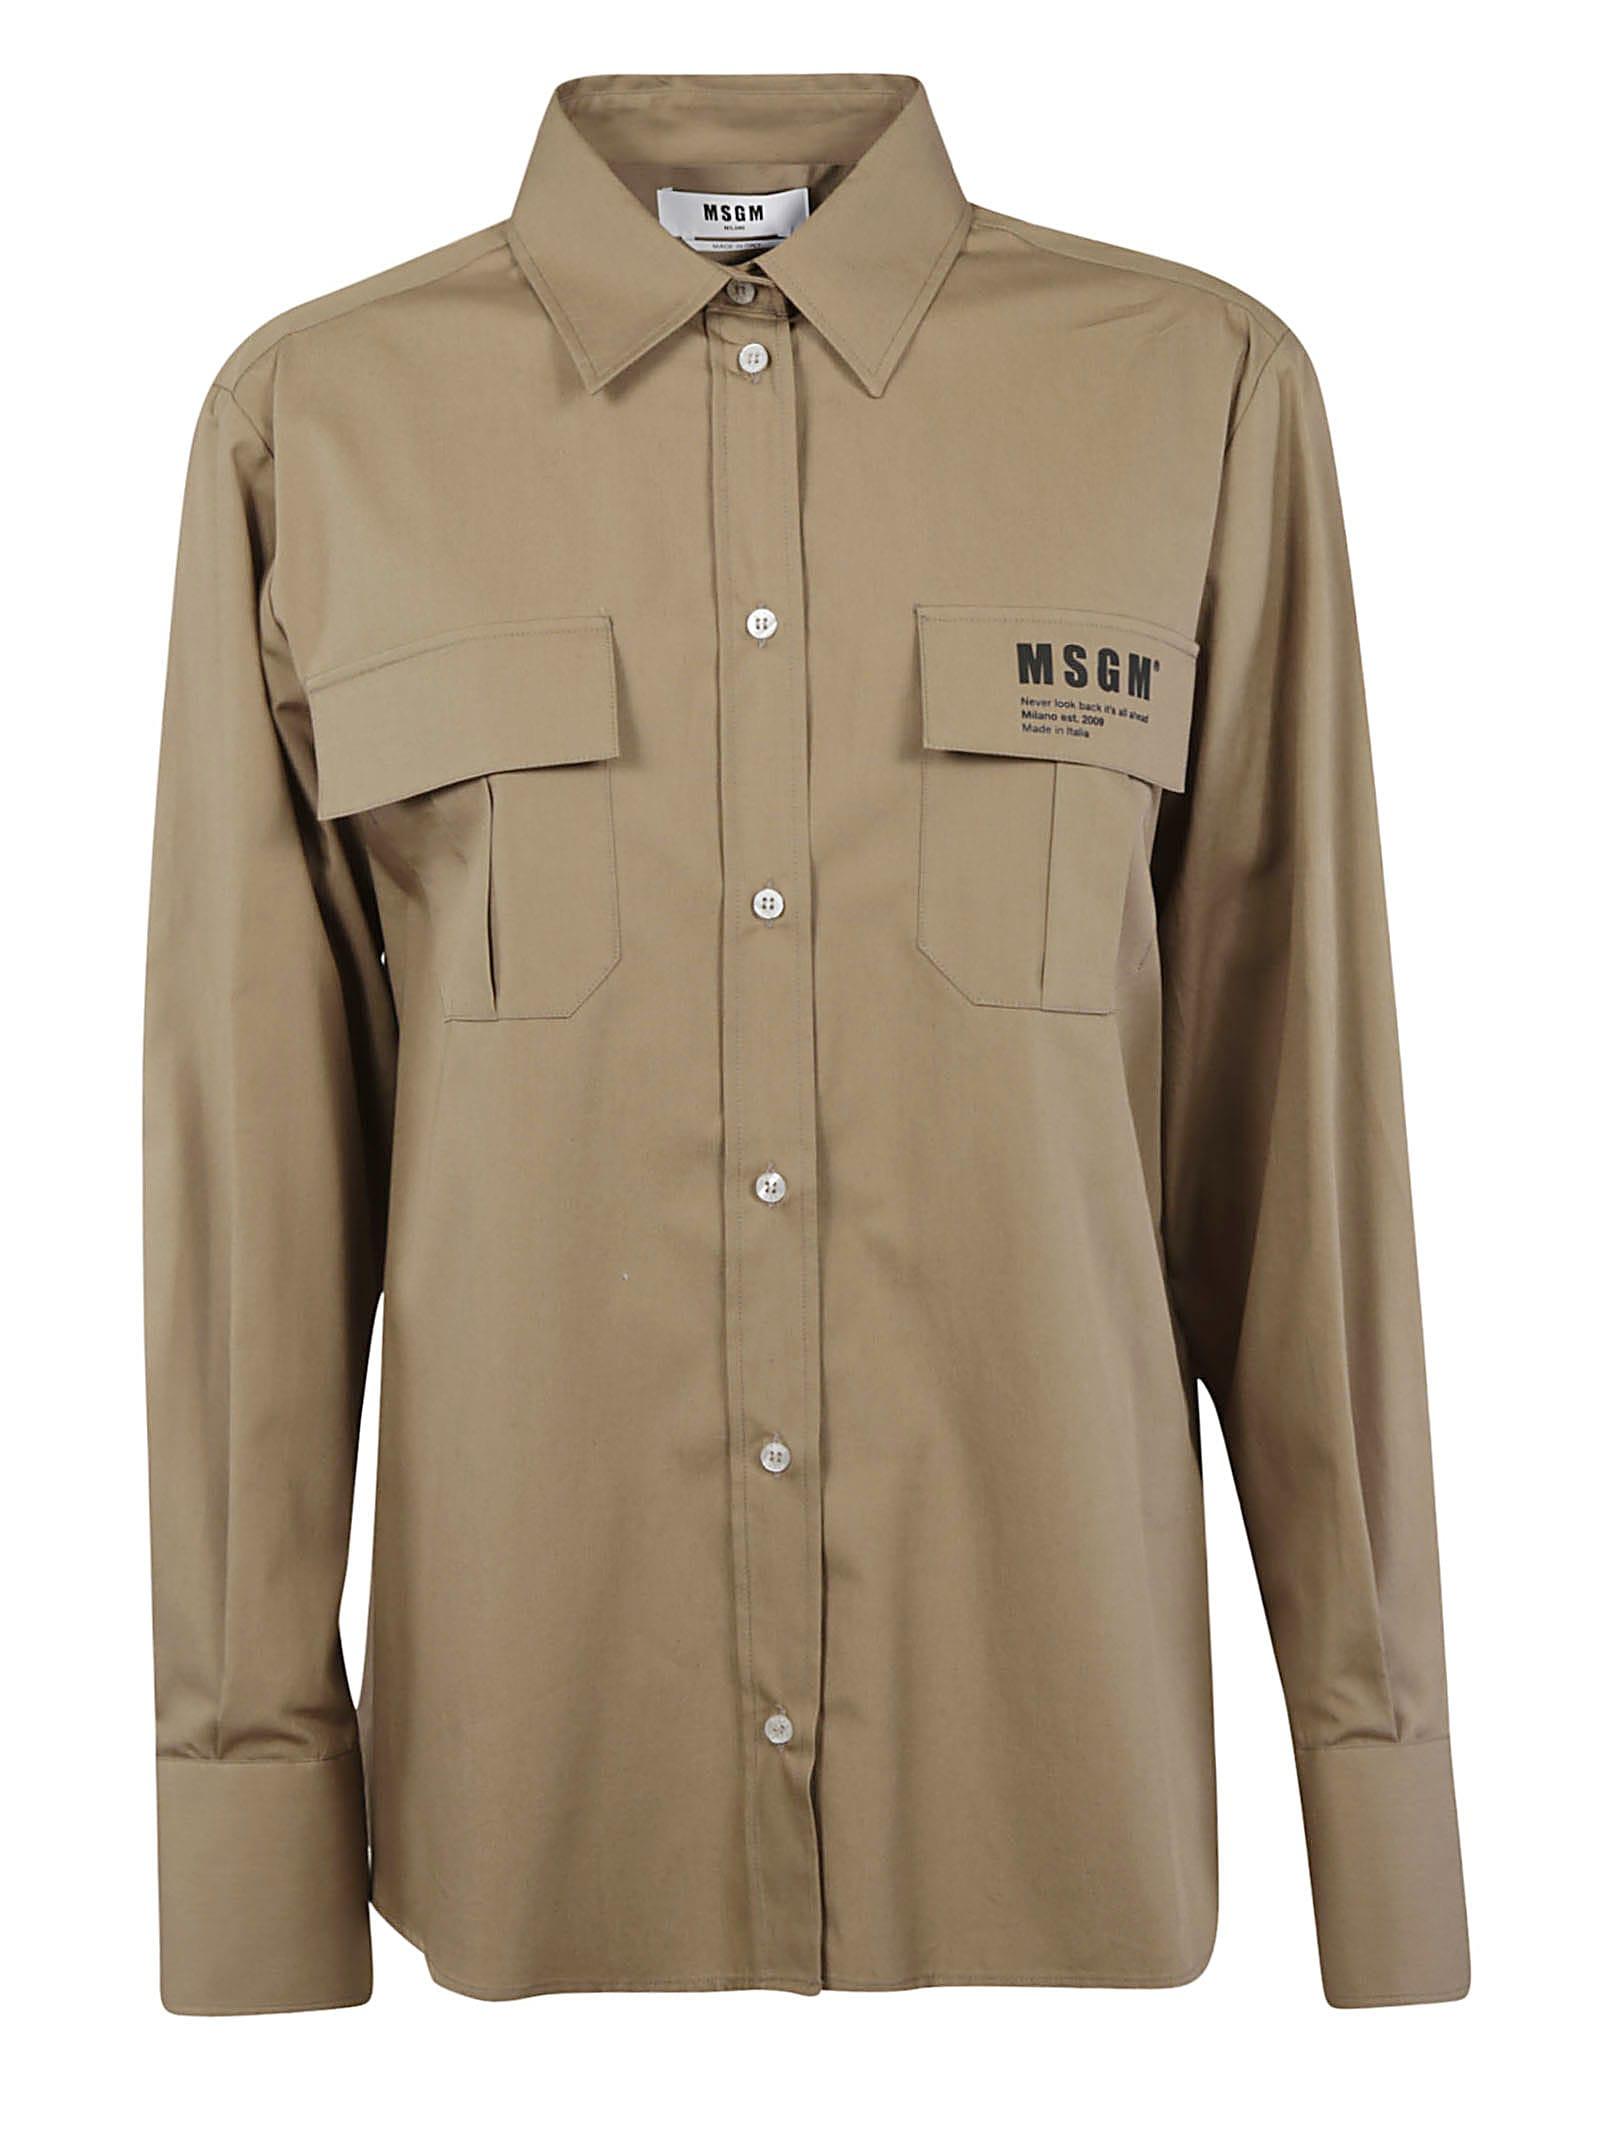 Double Chest Pocket Shirt